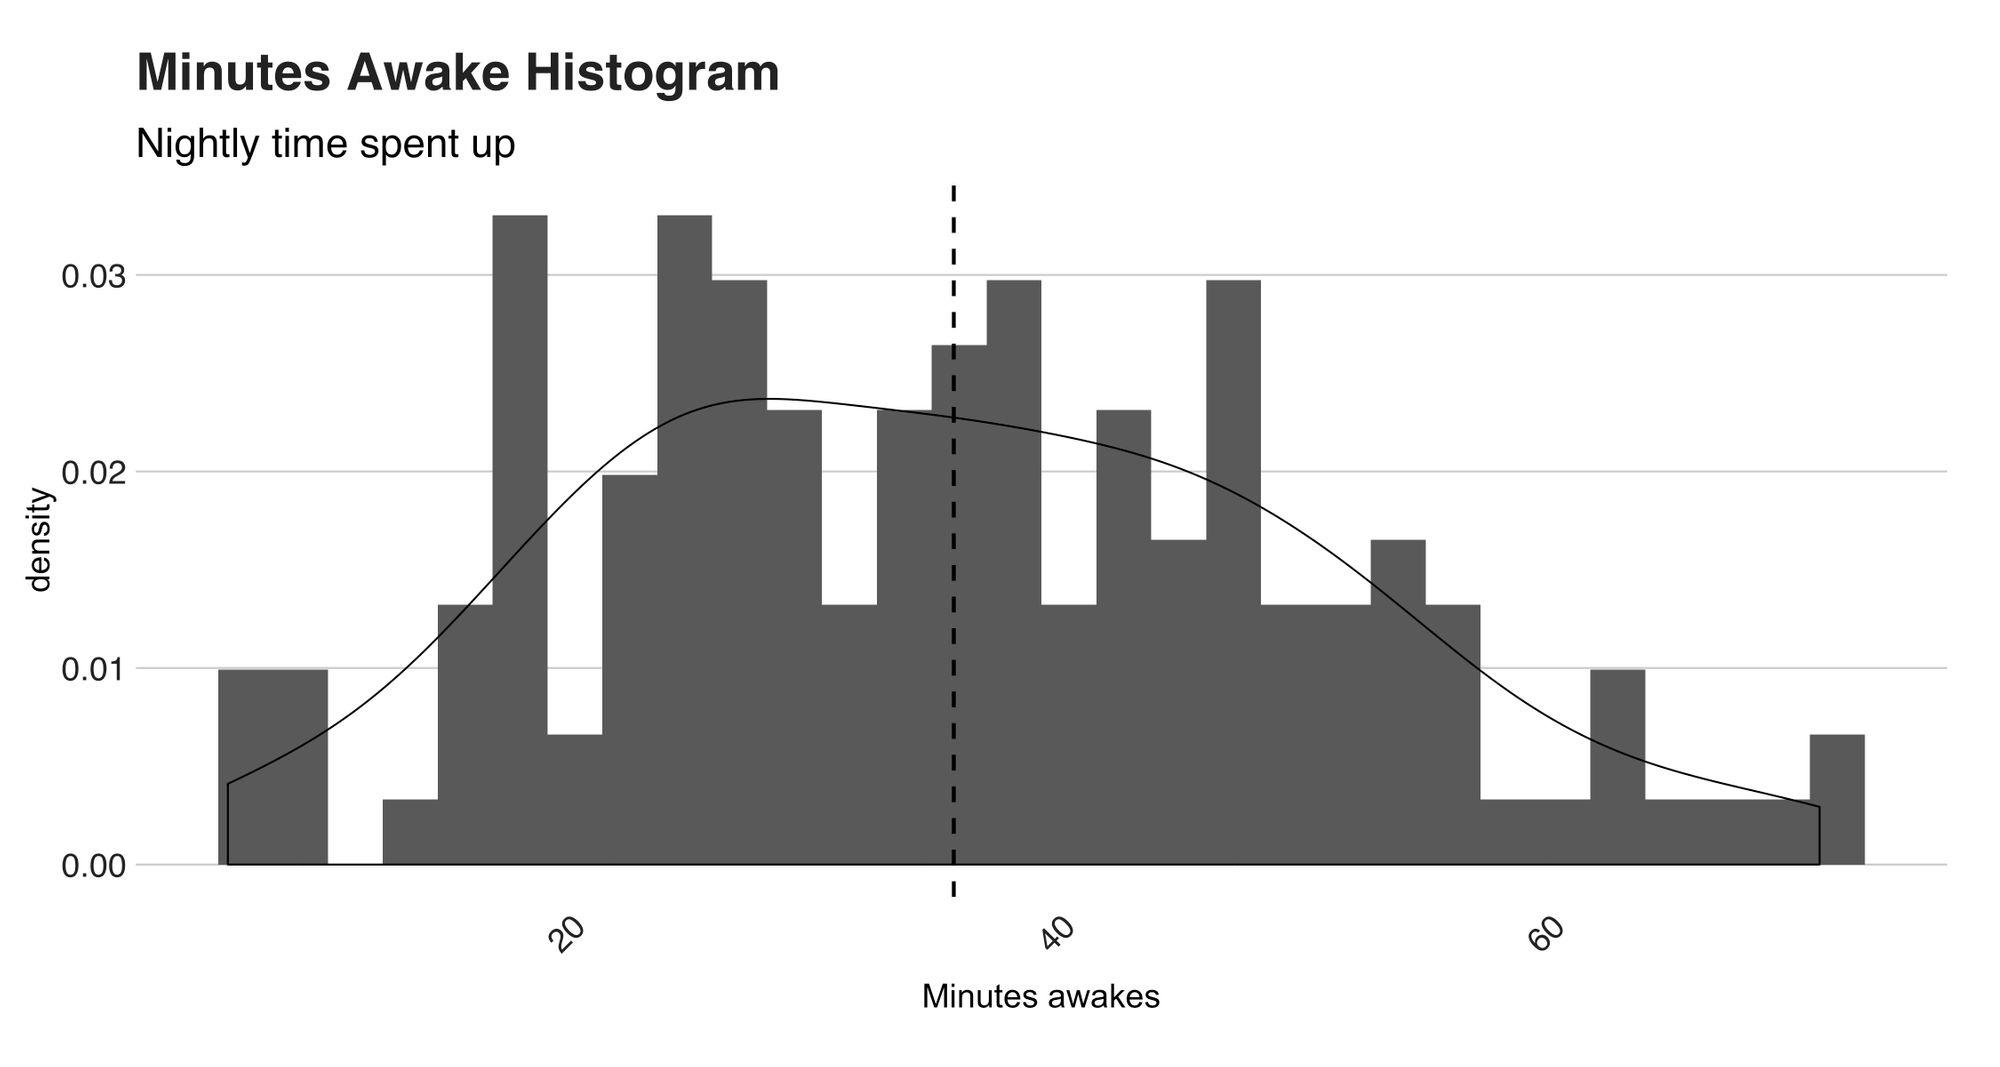 Minutes Awake Histogram